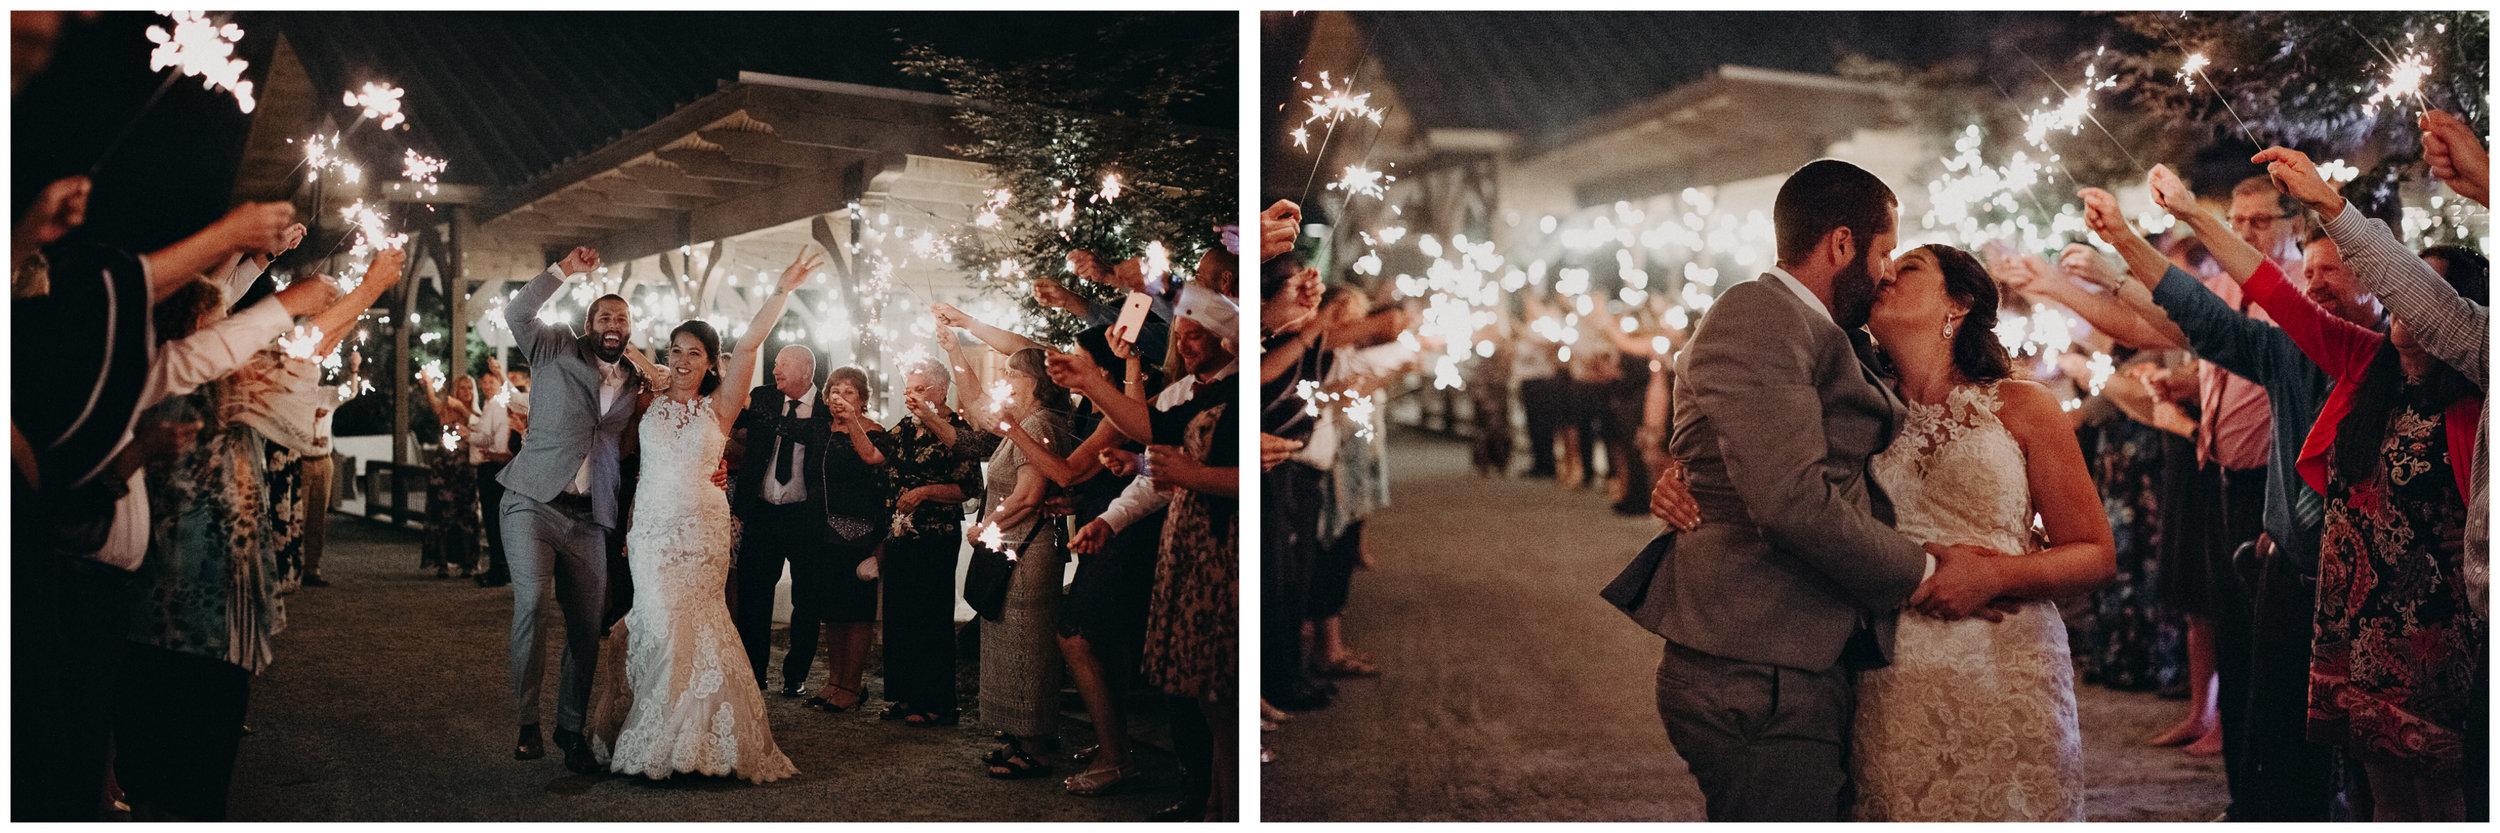 94  wedding day portraits bride and groom atlanta - georgia - ga wedding details - photographer .jpg